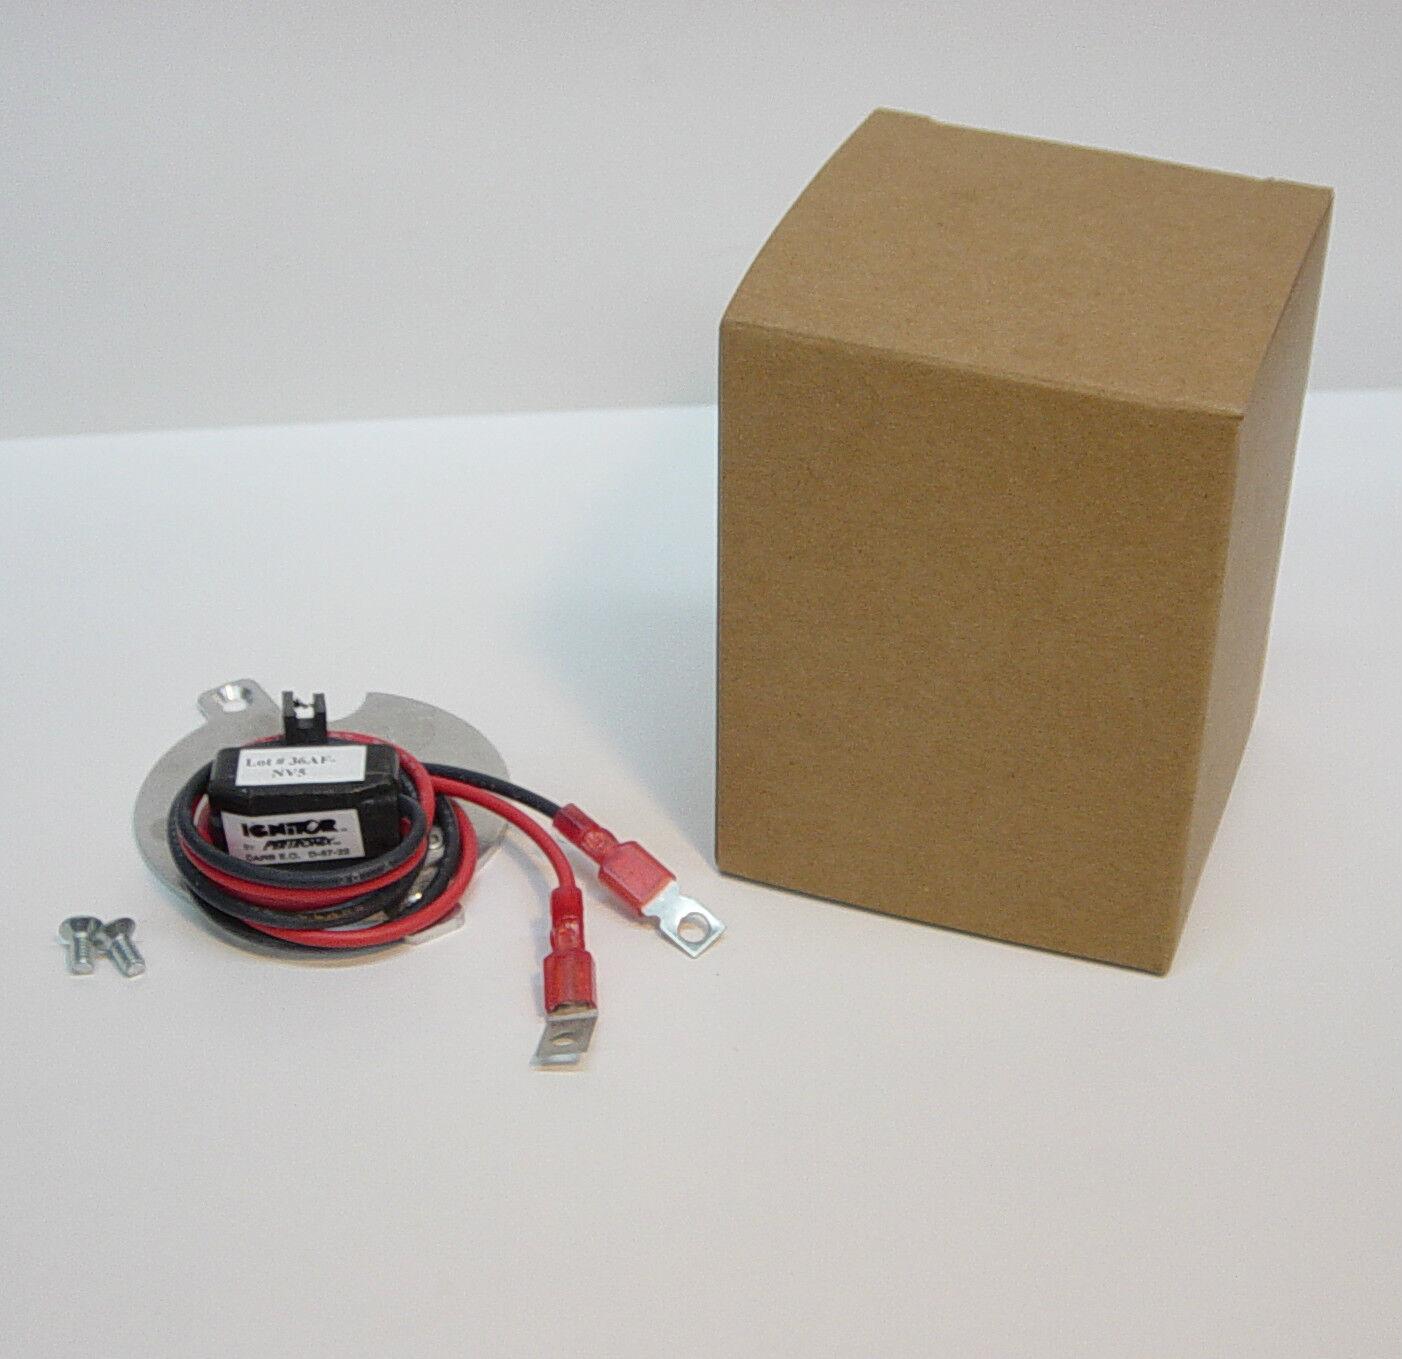 Wisconsin Vh4d W4-1770 V465d 4-cyl Per-lux Distributor Module 20120005